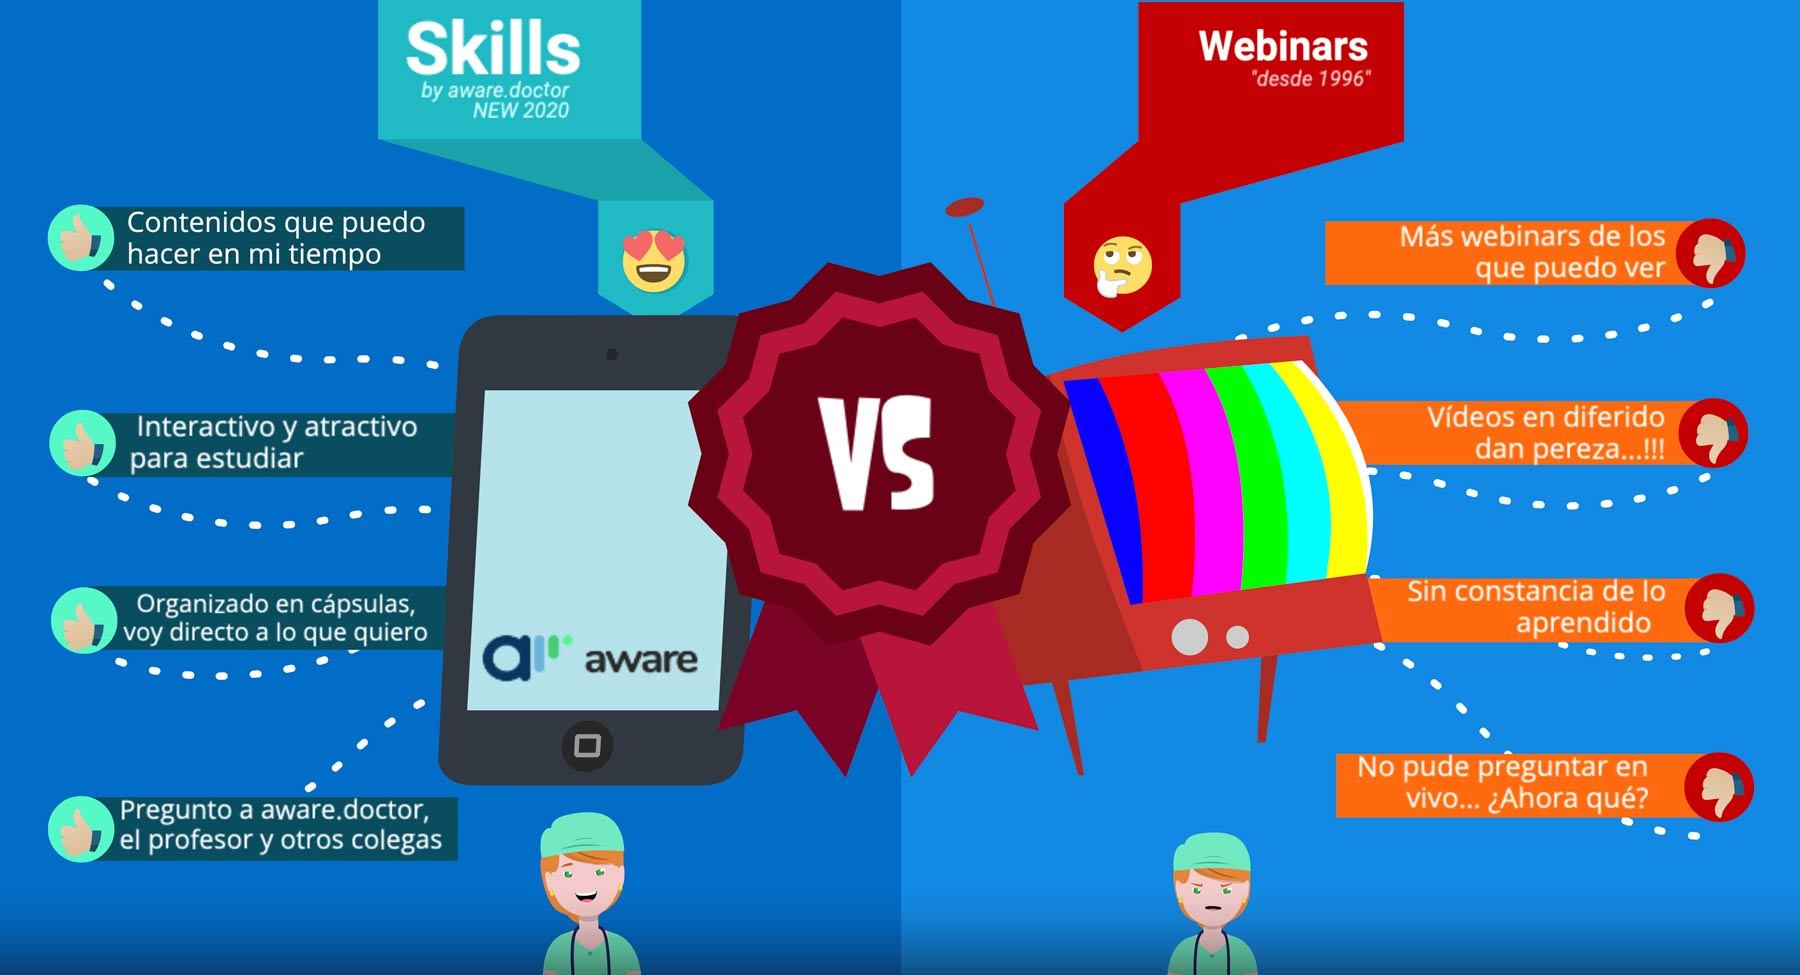 skills vs webinars infographic